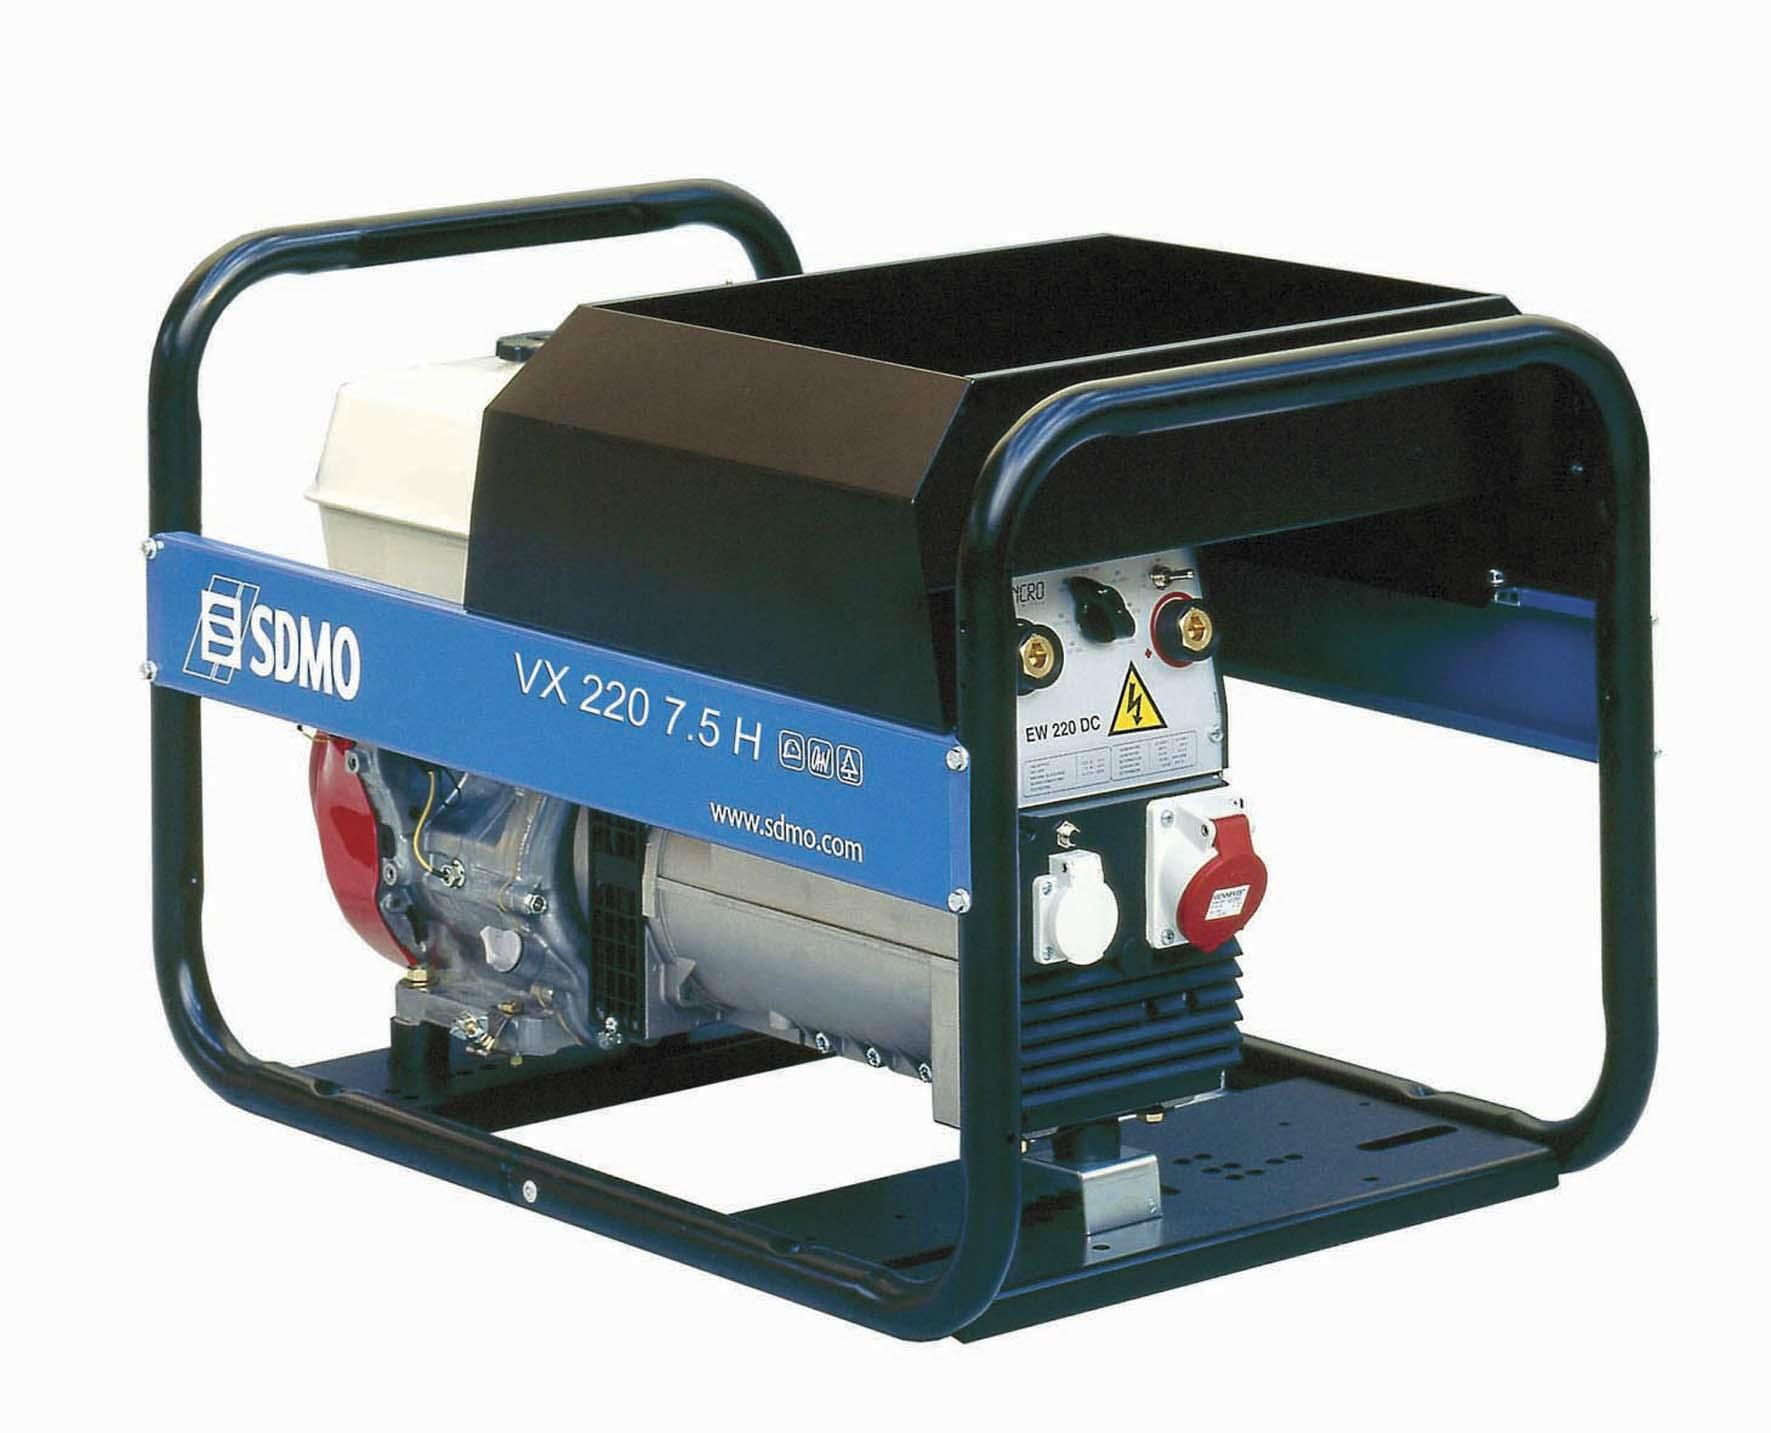 sdmo vx 220 7 5 hс руководство по эксплуатации